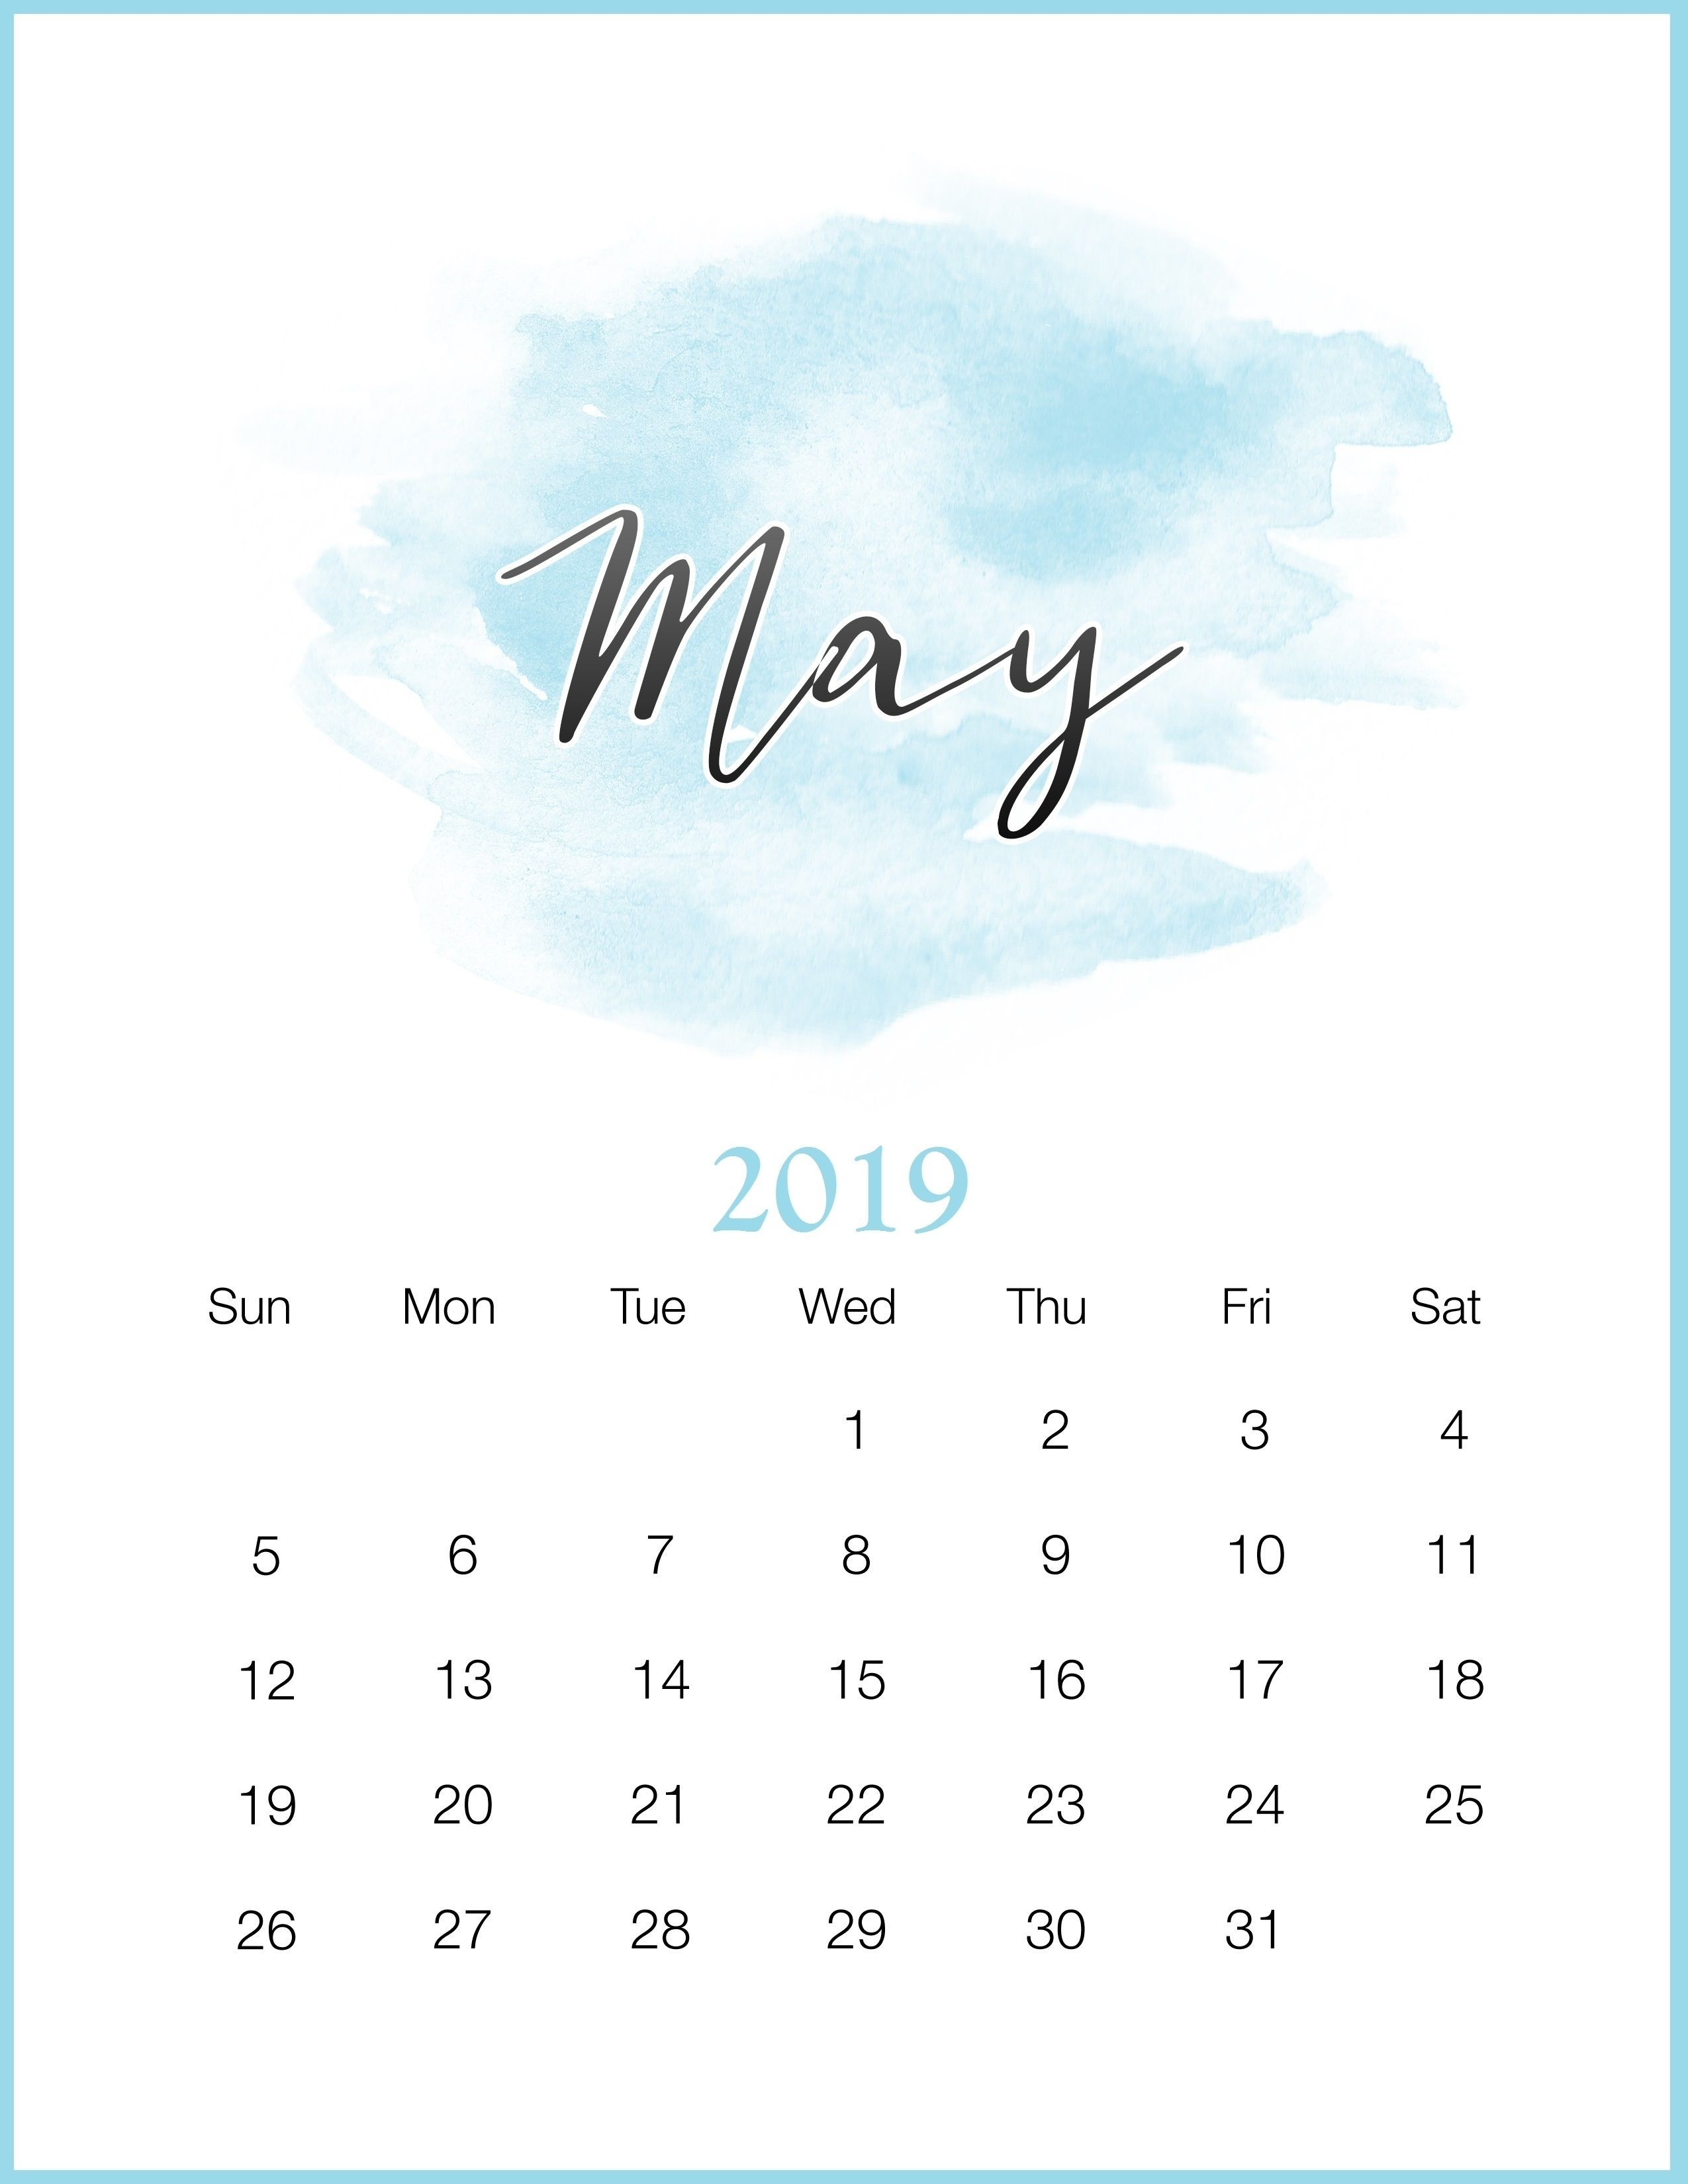 watercolor 2019 monthly printable calendar calendar 2019may 2019